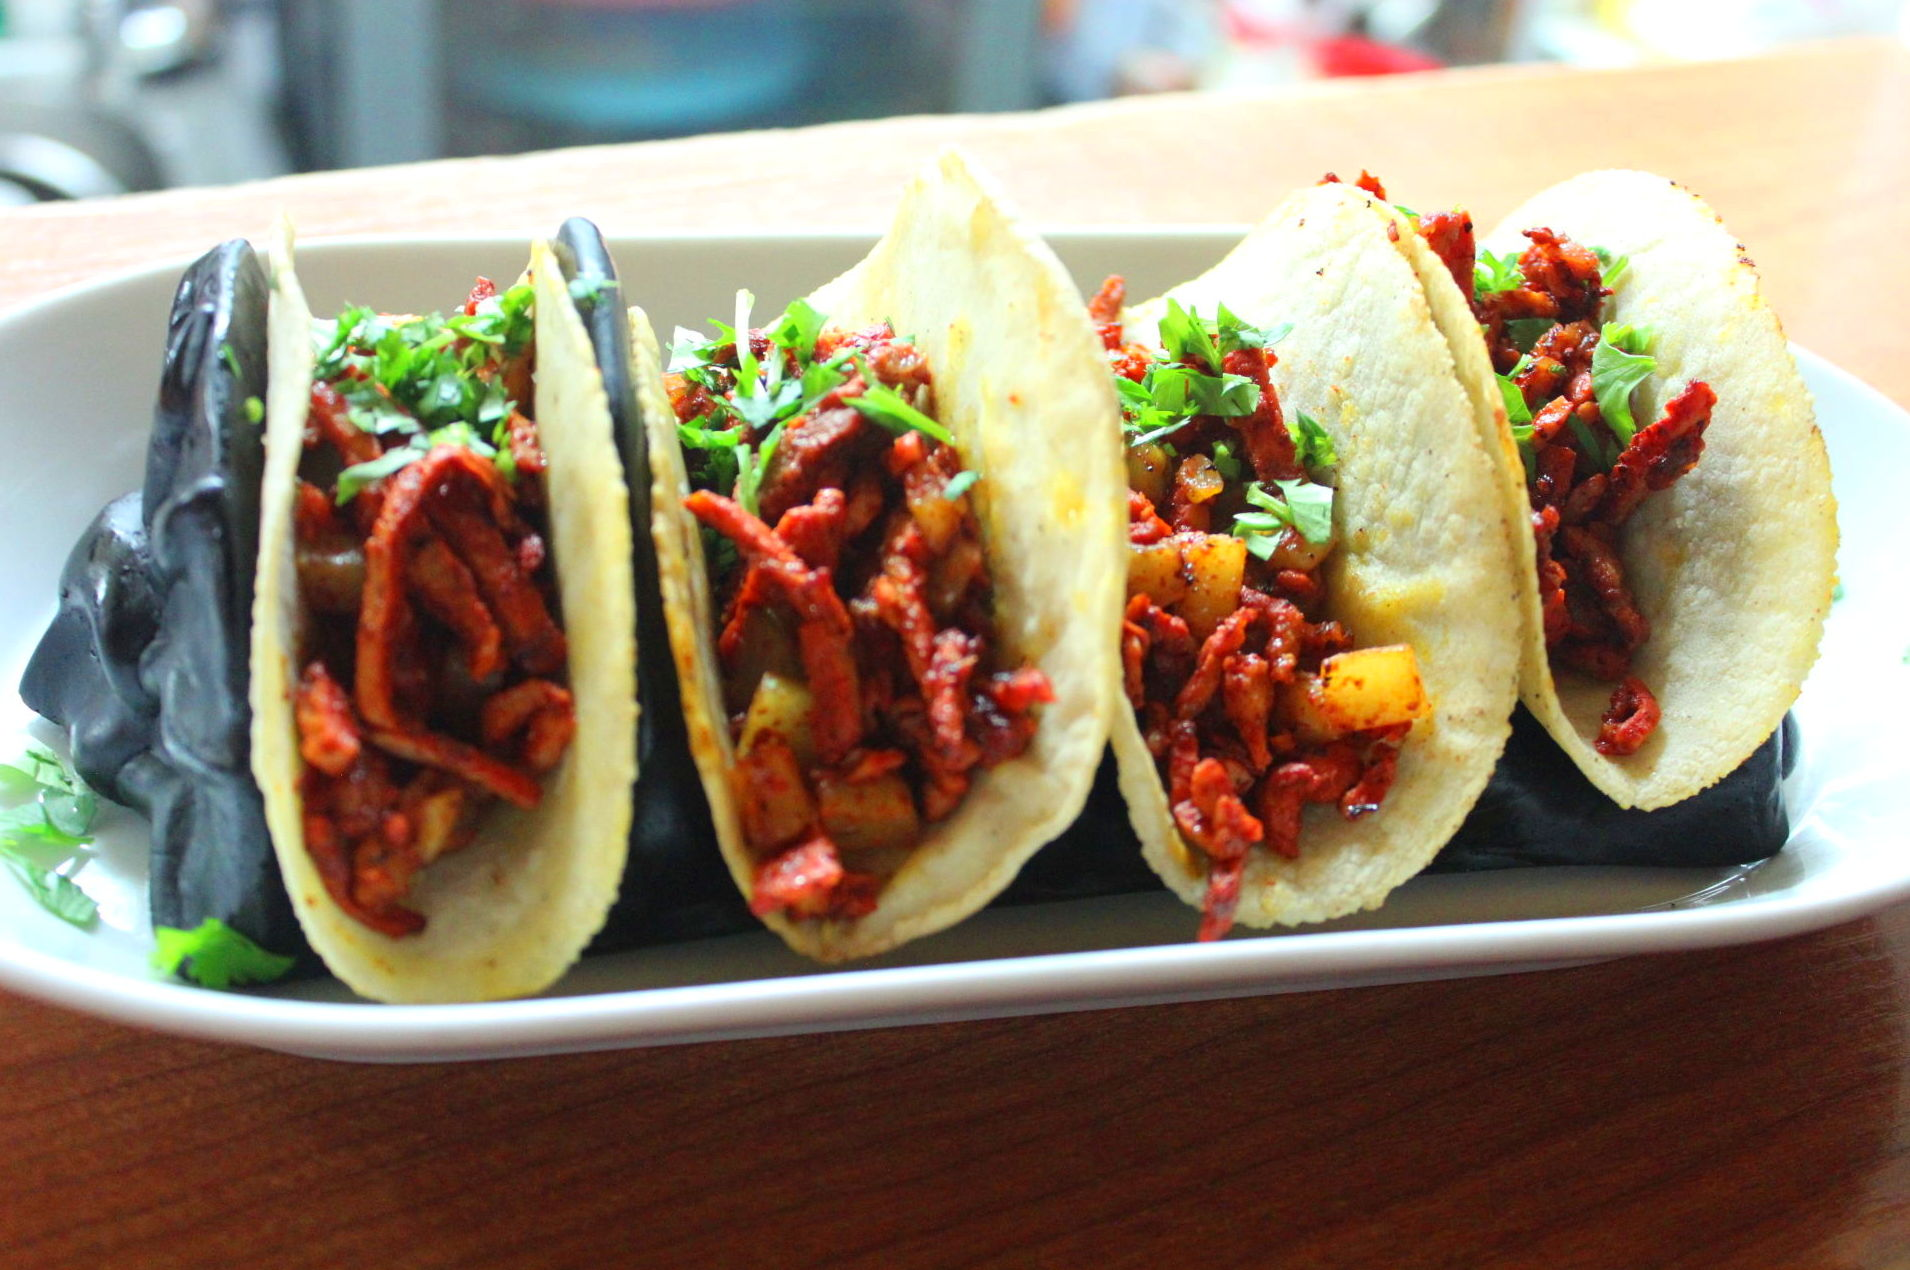 Picture 15 of Cocina mexicana in  | CARLOS FERNÁNDEZ CARRASCO